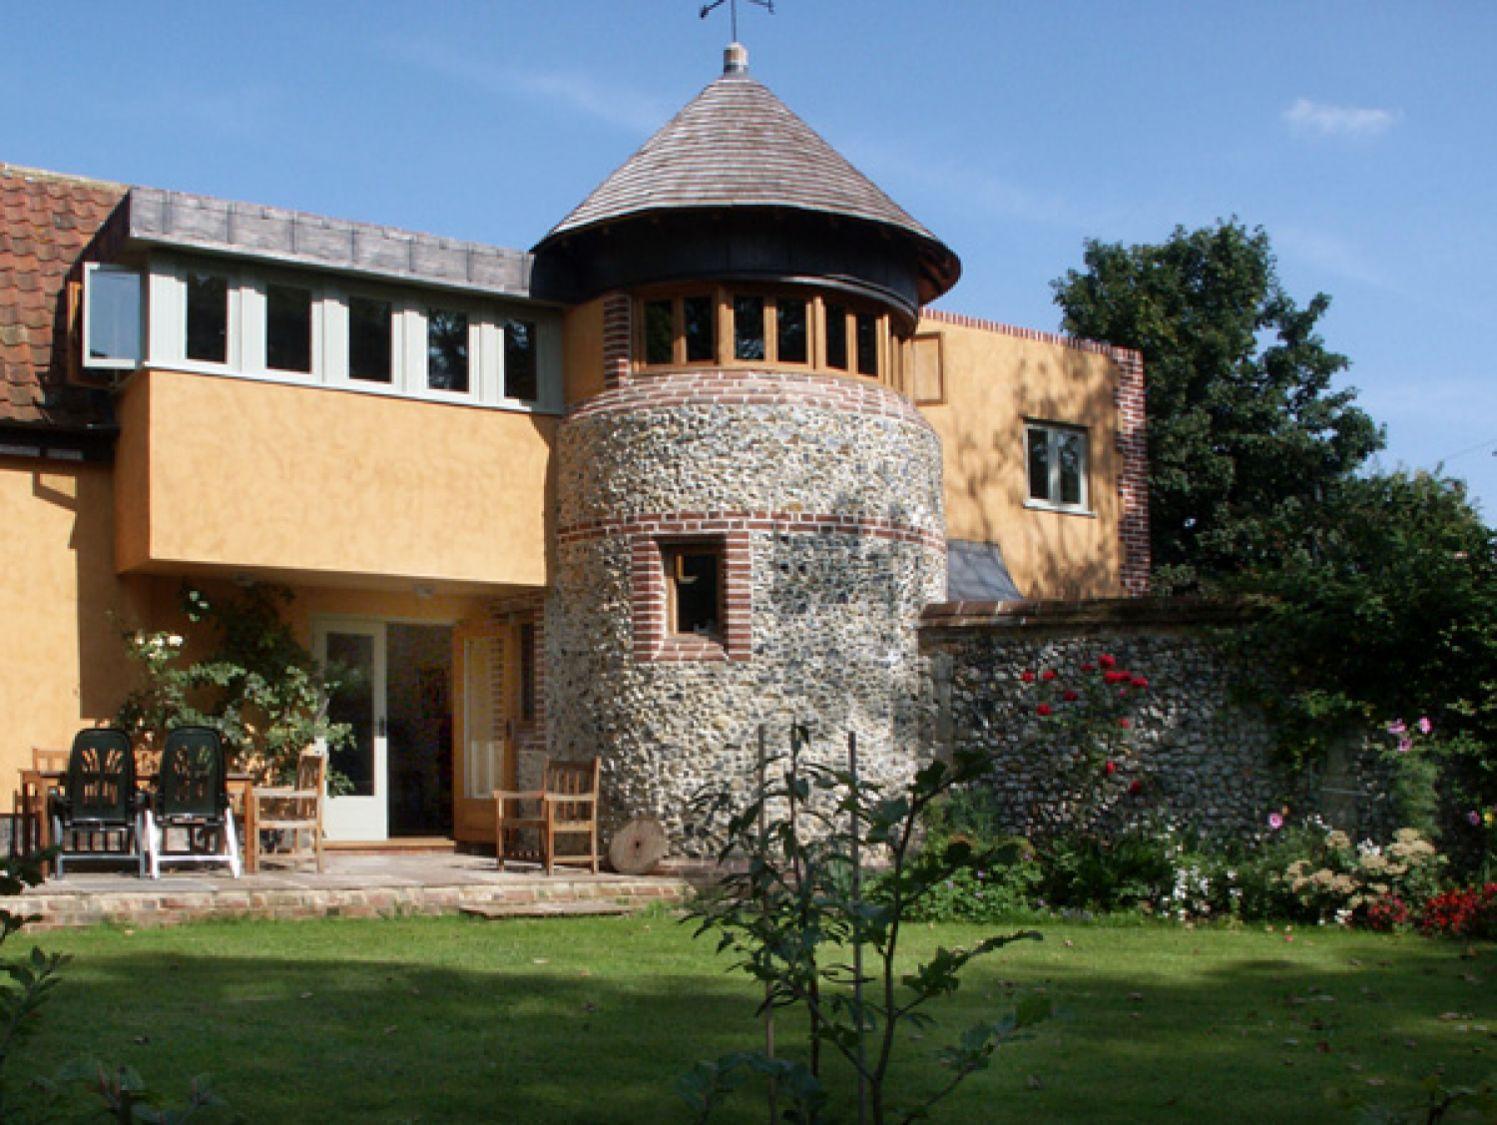 Rectory Cottage - Norfolk - 1605 - photo 1